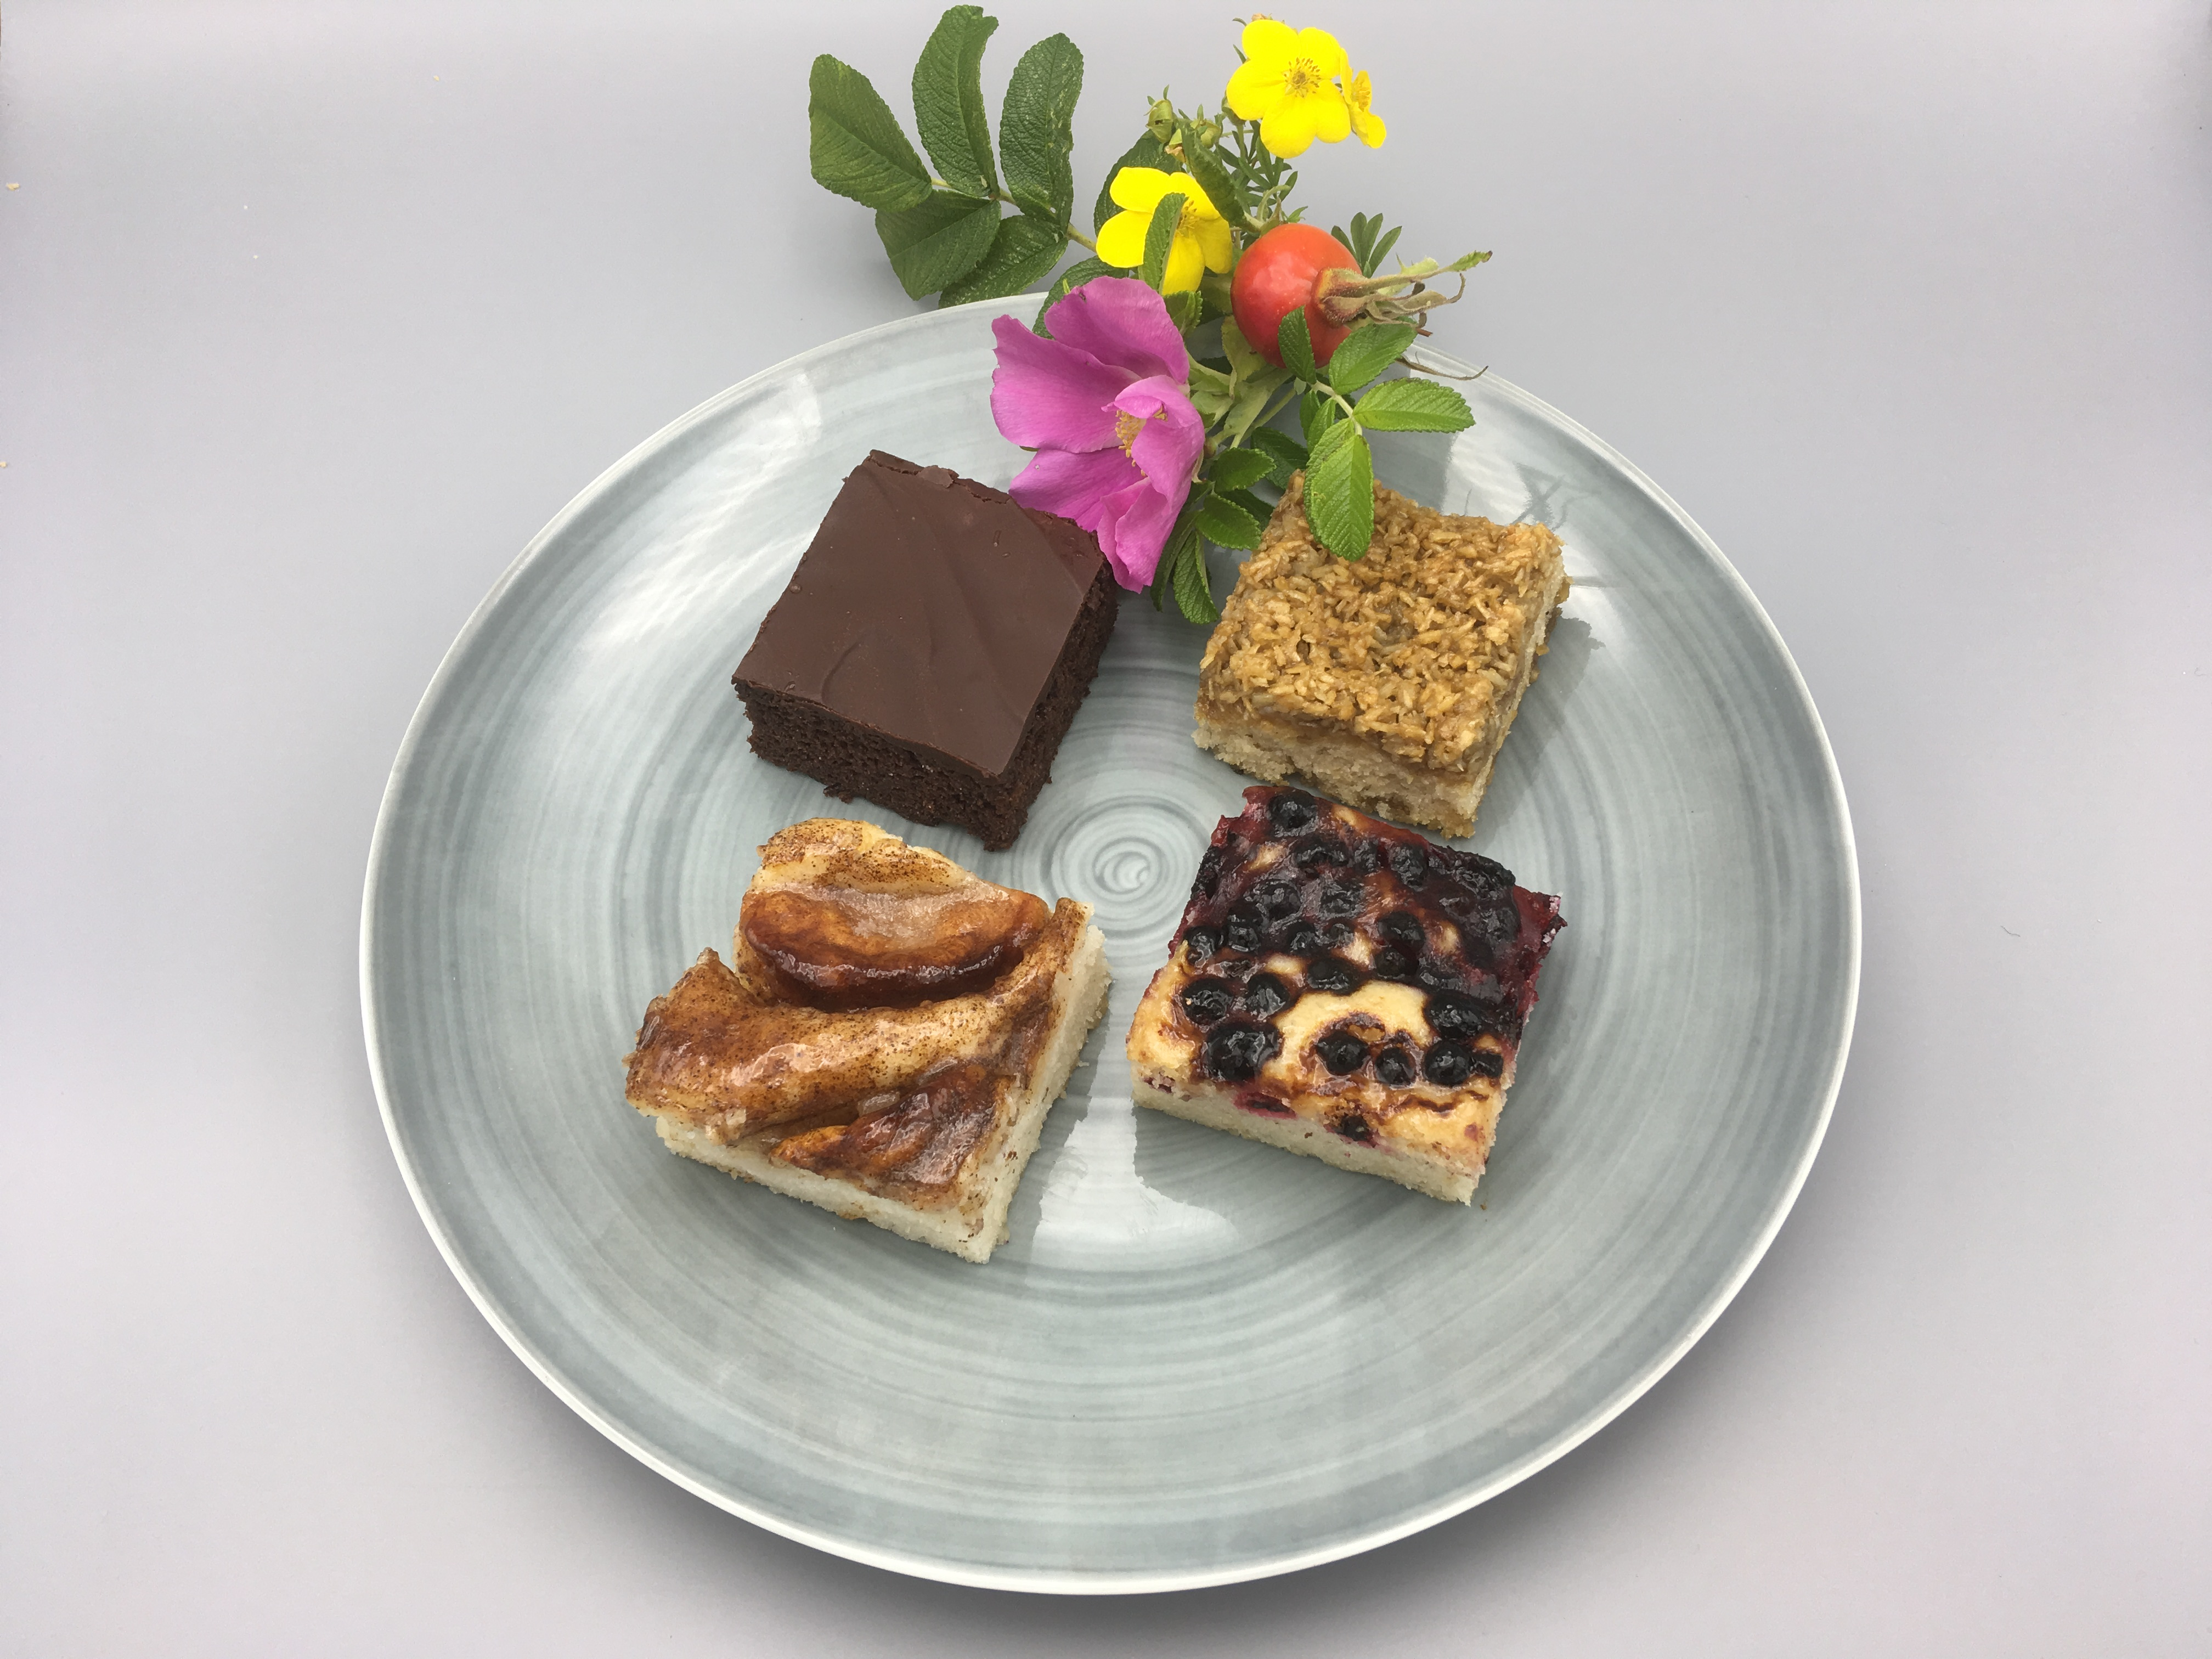 𝗡𝗬𝗛𝗘𝗗 Rosa´s Skovbærkage, Aya´s Chokolade, EVA`s Æblekage, Karla´s Drømmekage, 𝗡𝗬𝗛𝗘𝗗